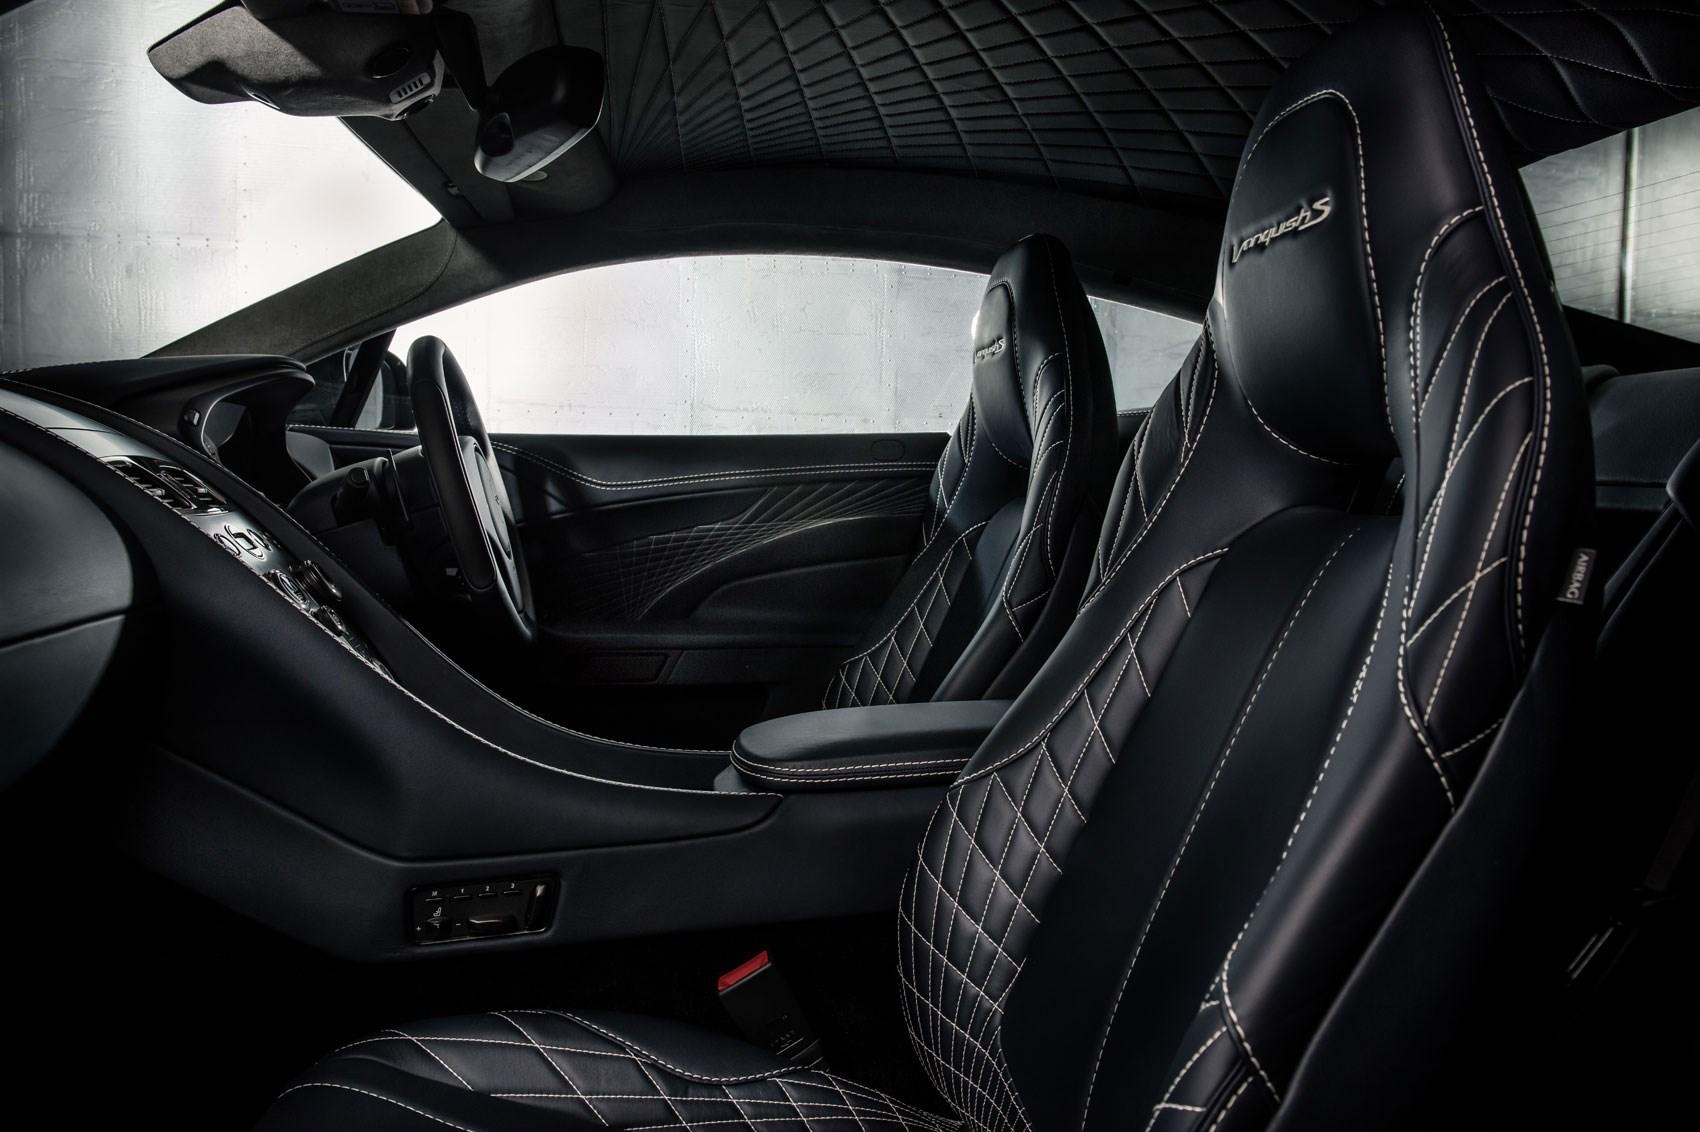 aston martin unveils 595bhp vanquish s | car magazine